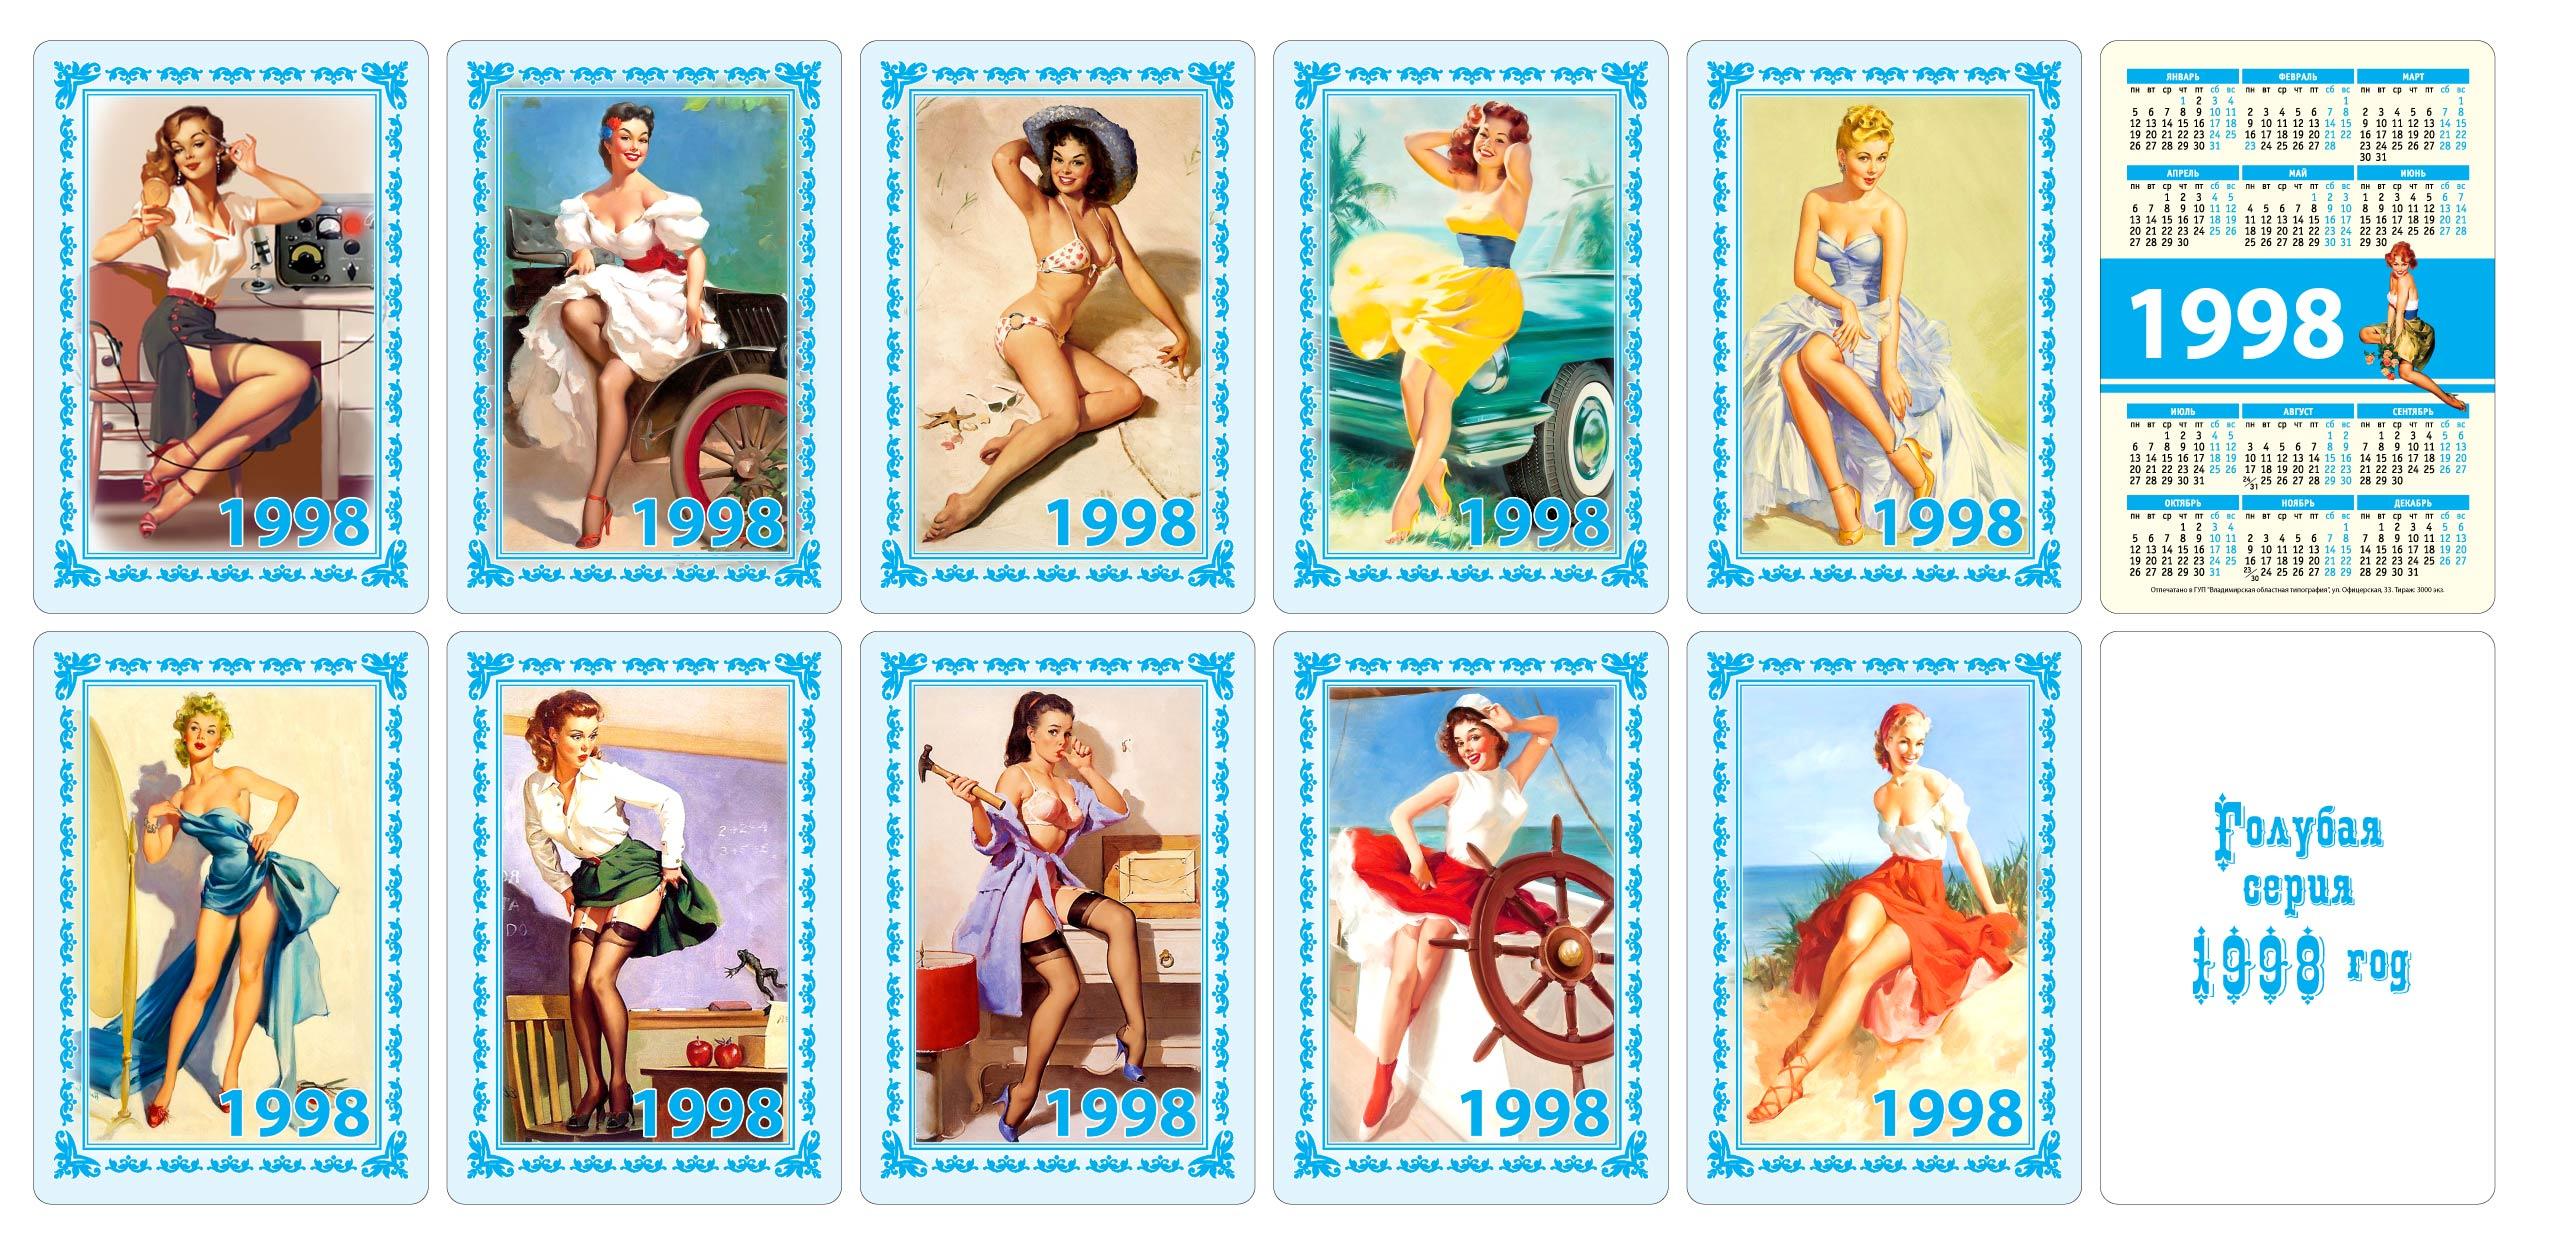 Карманные календарики серии пин-ап - Голубая серия